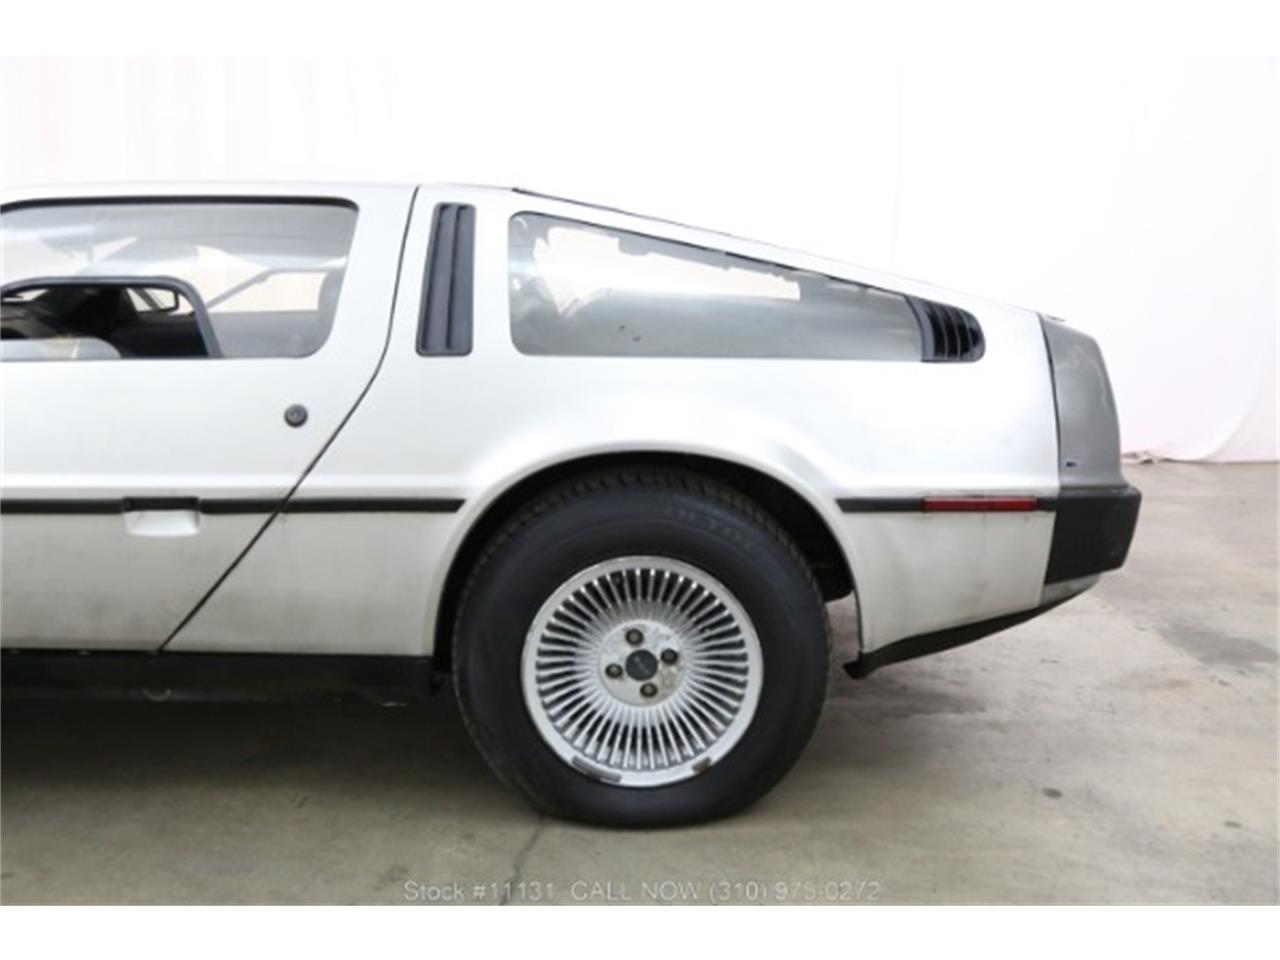 Large Picture of '81 DeLorean DMC-12 located in California - $19,500.00 - QNPP